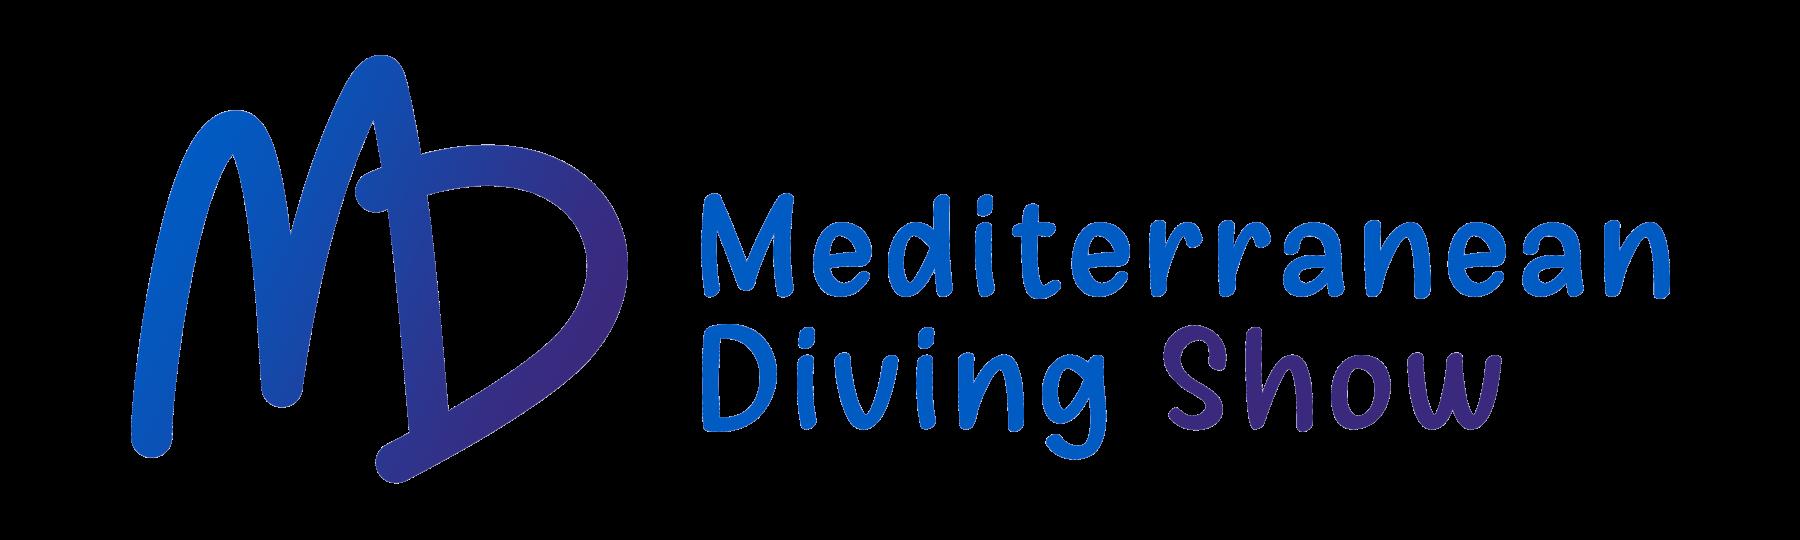 Mediterranean Diving Show